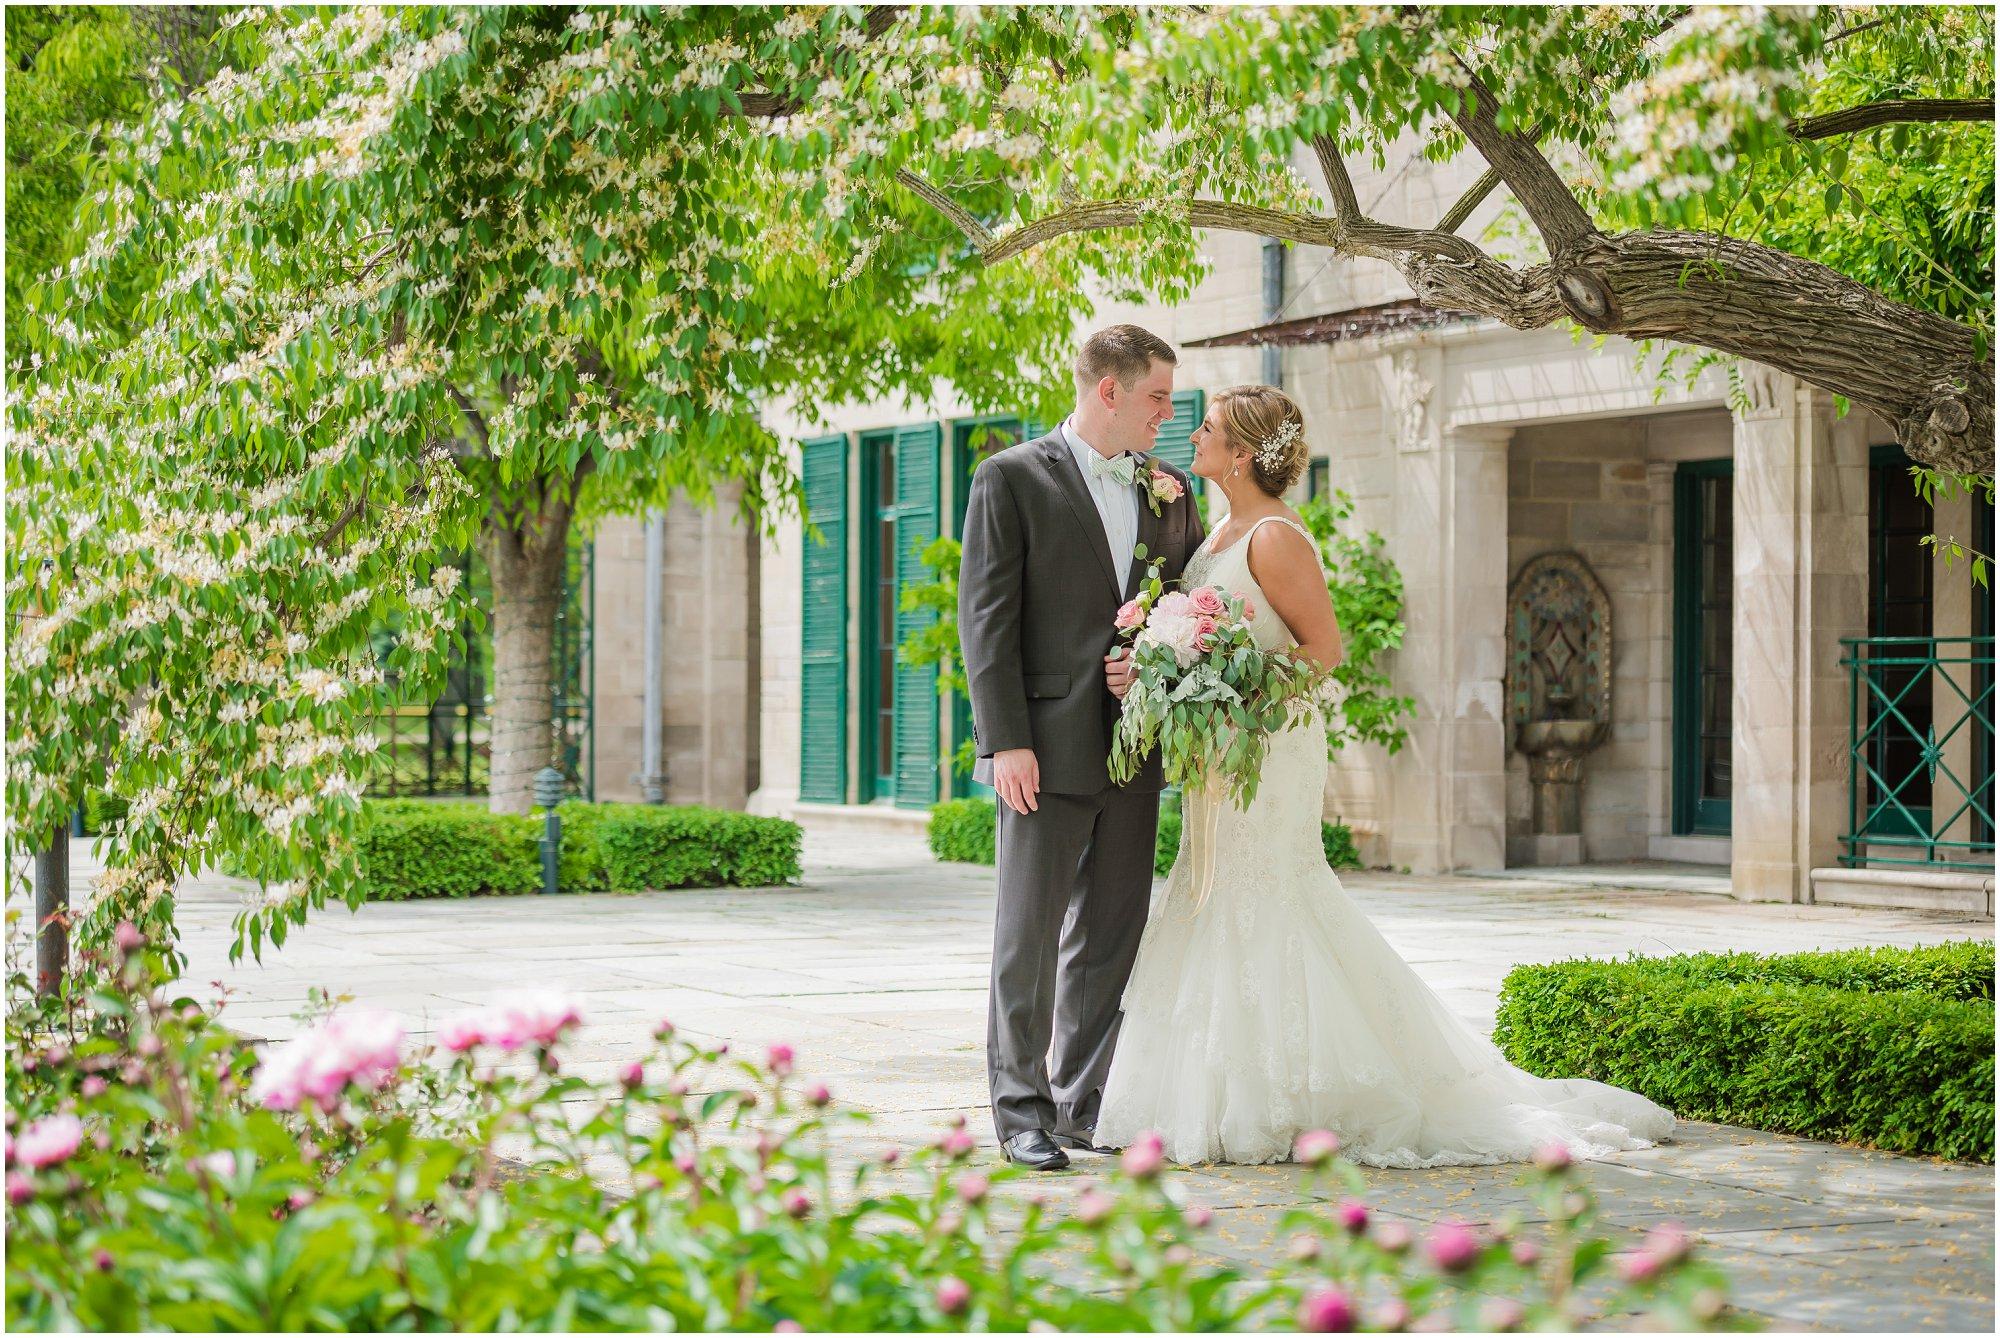 Plymouth_michigan_wedding_photographer_0407.jpg